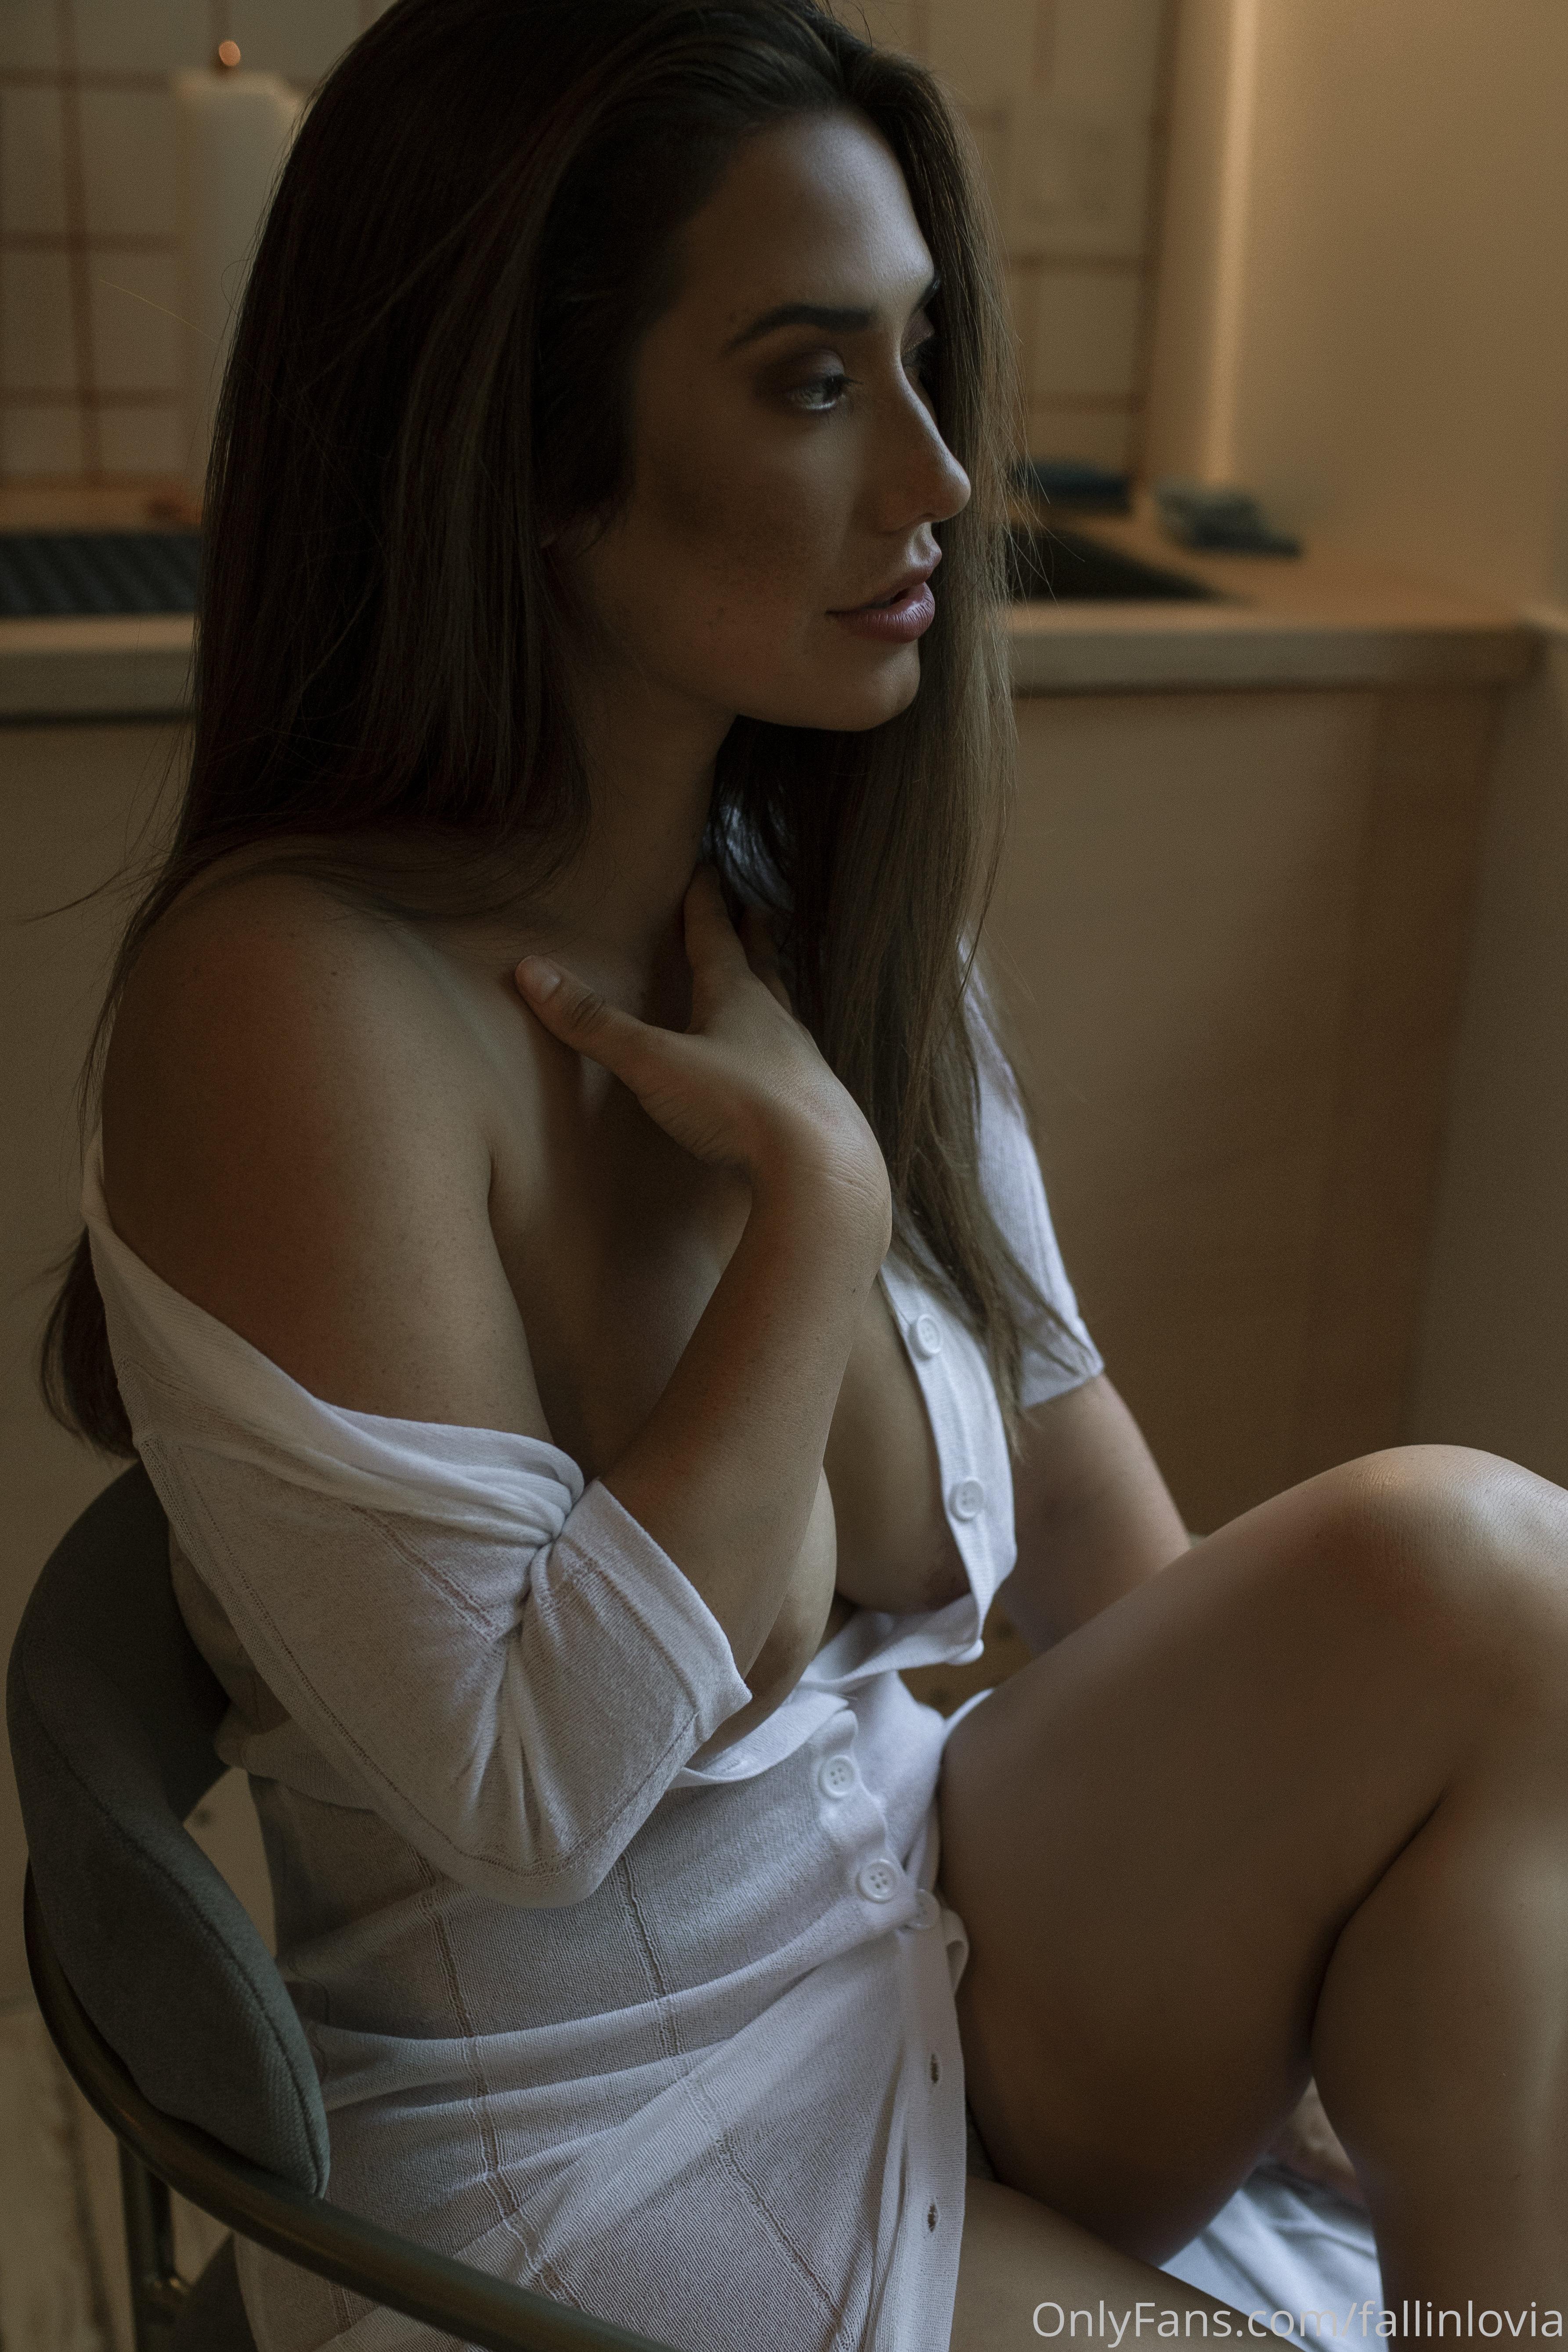 Eva Lovia, Fallinlovia, Onlyfans 0200